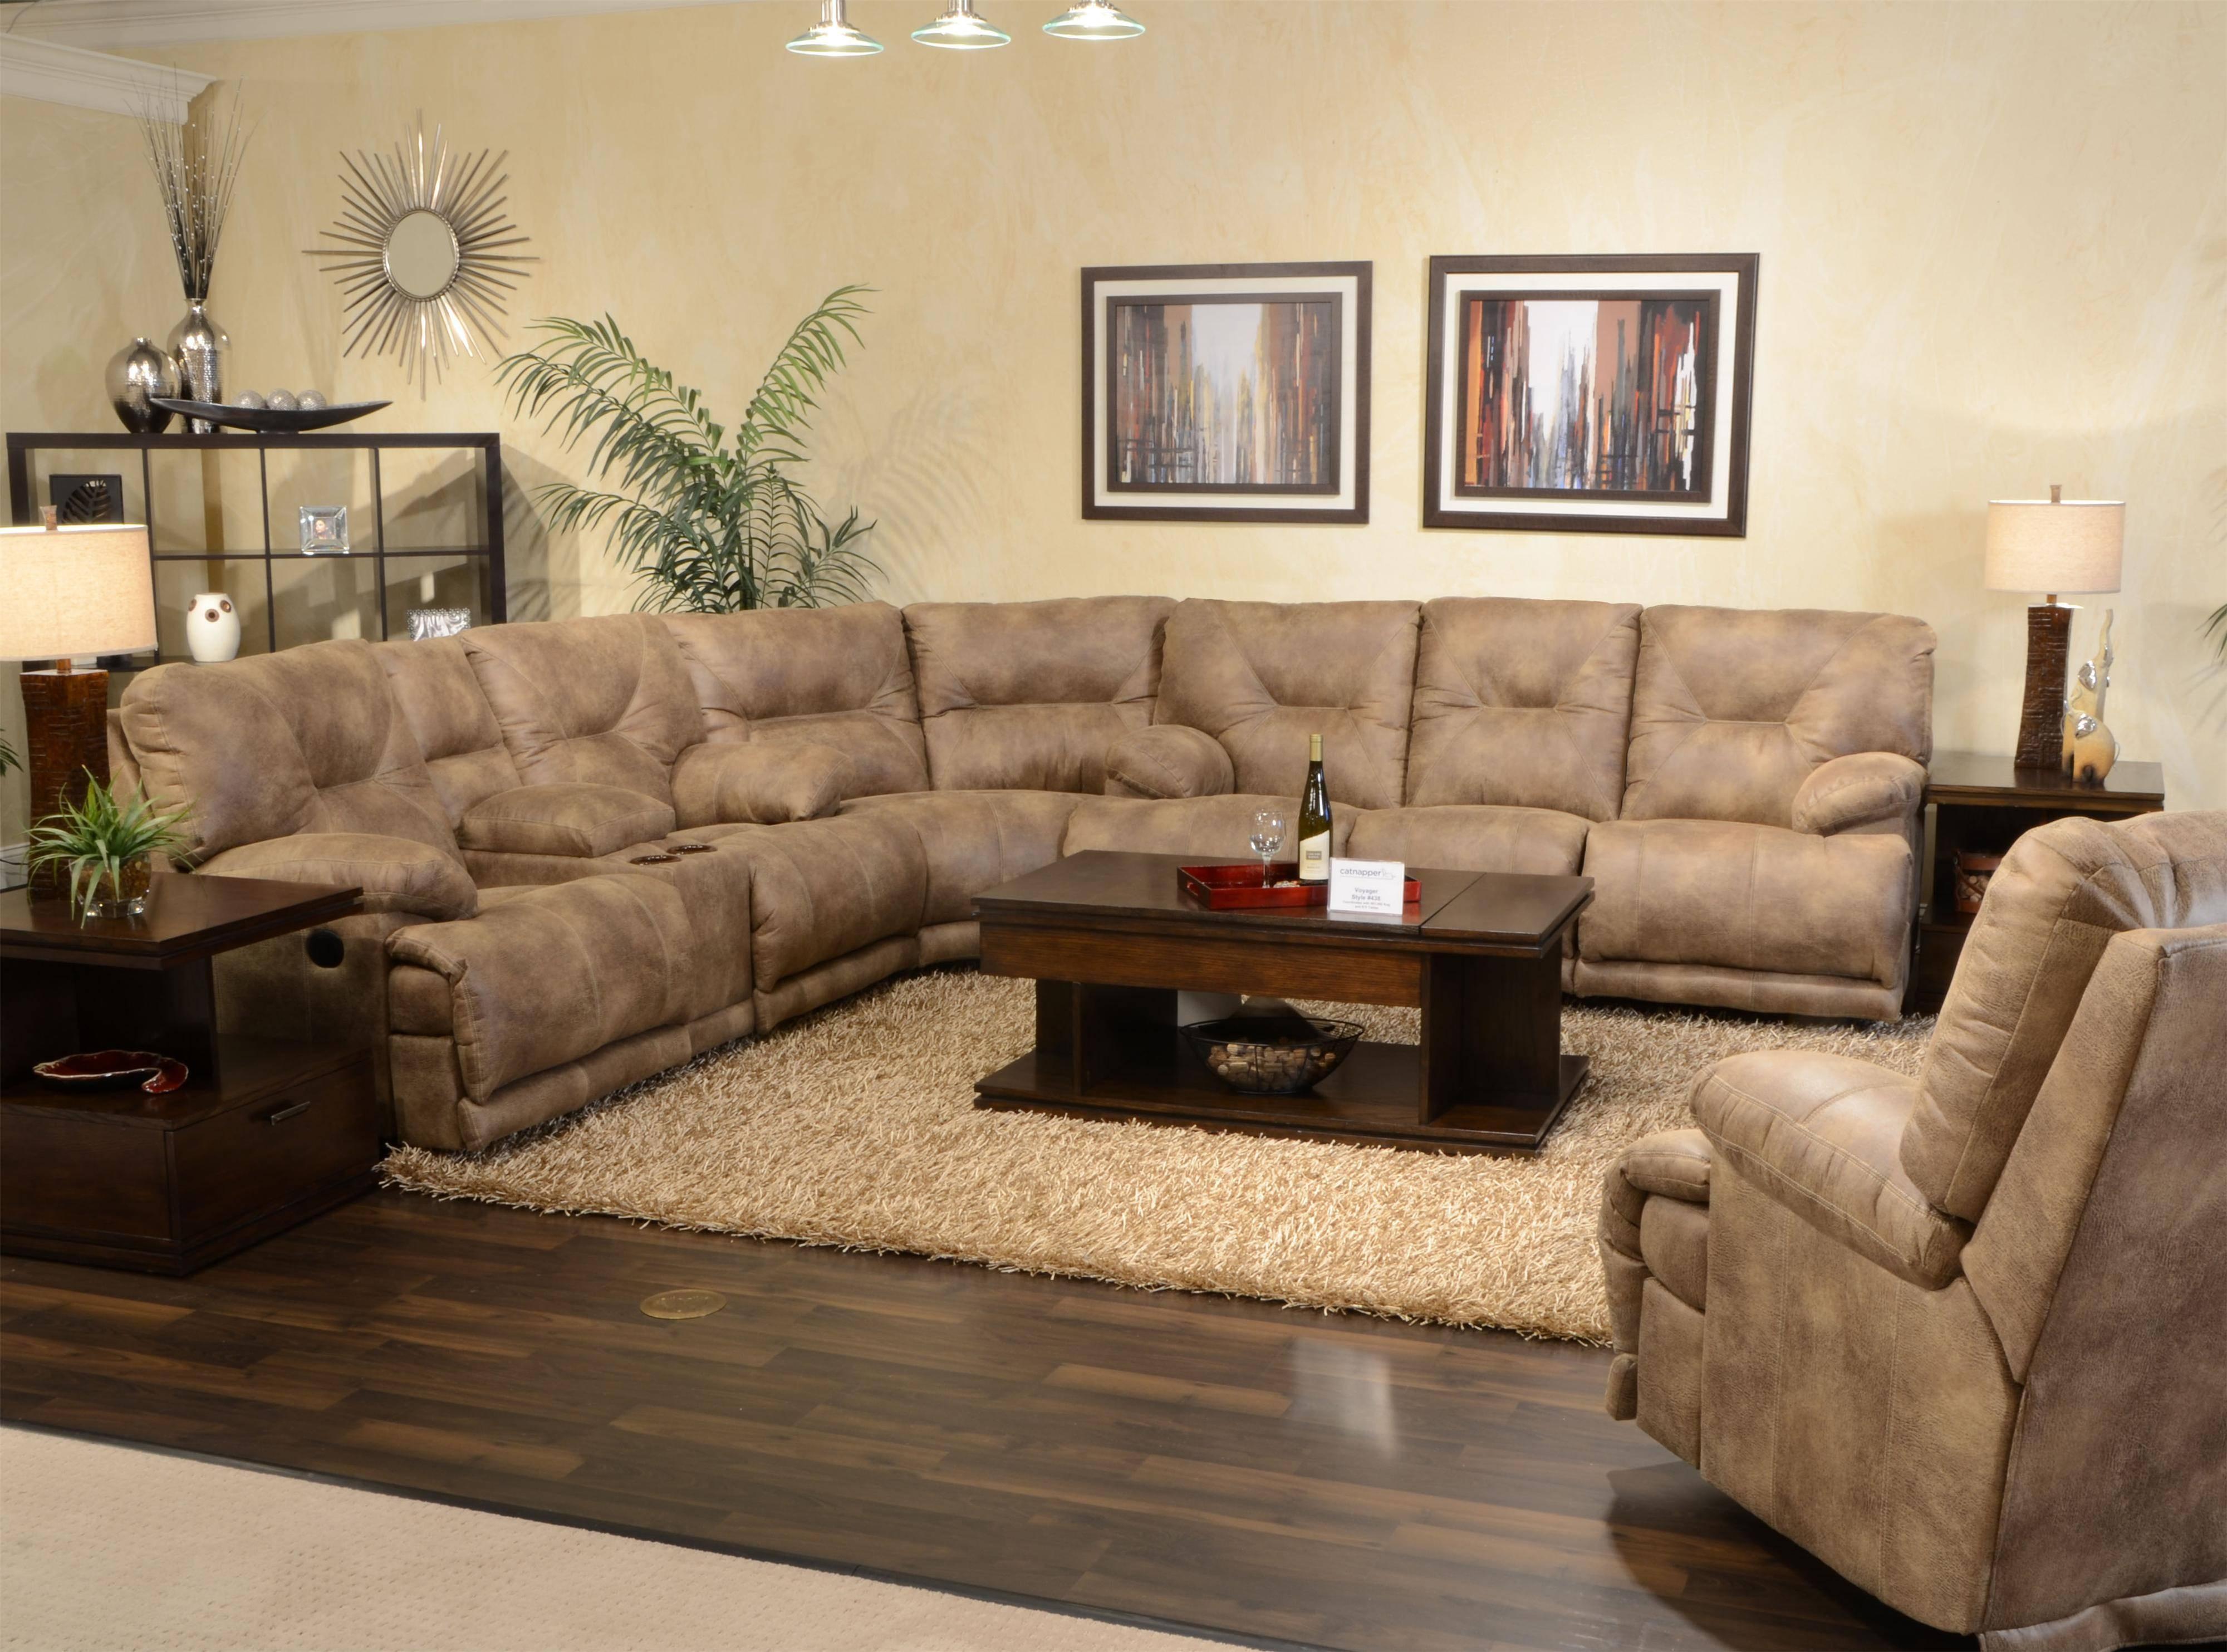 Sofa: Catnapper Reclining Sofa | Home Interior Design Within Catnapper Recliner Sofas (View 14 of 15)